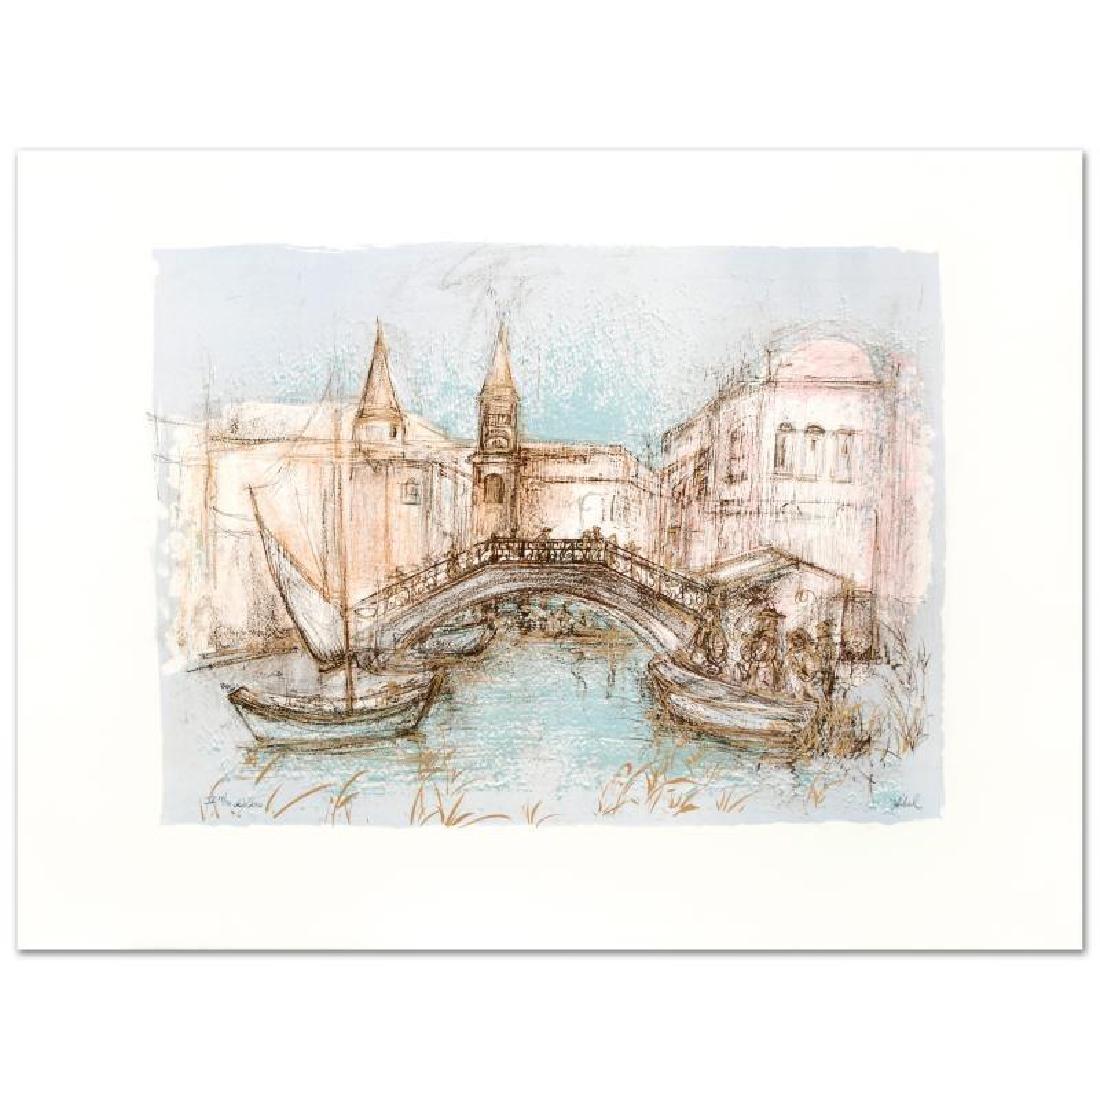 """Chioggia"" Limited Edition Lithograph by Edna Hibel"